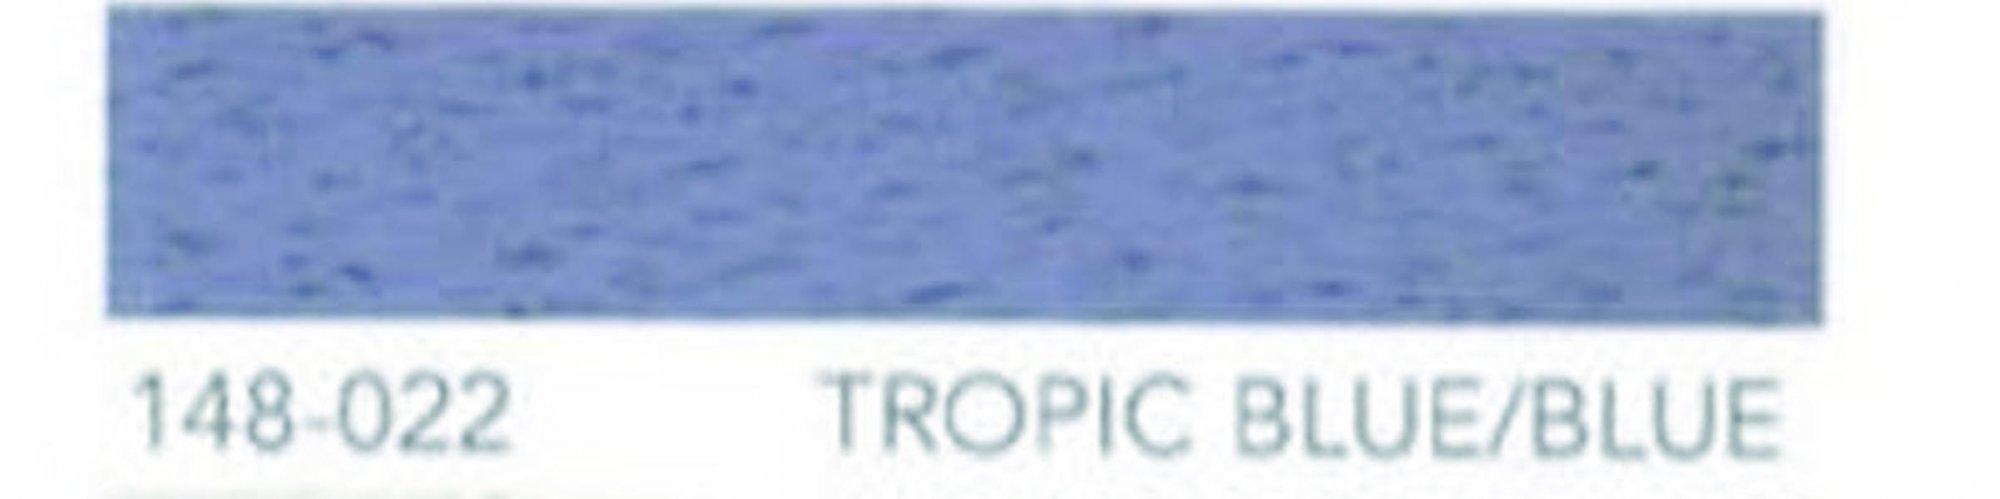 RF-148-022-TROPIC BLUE/BLUE